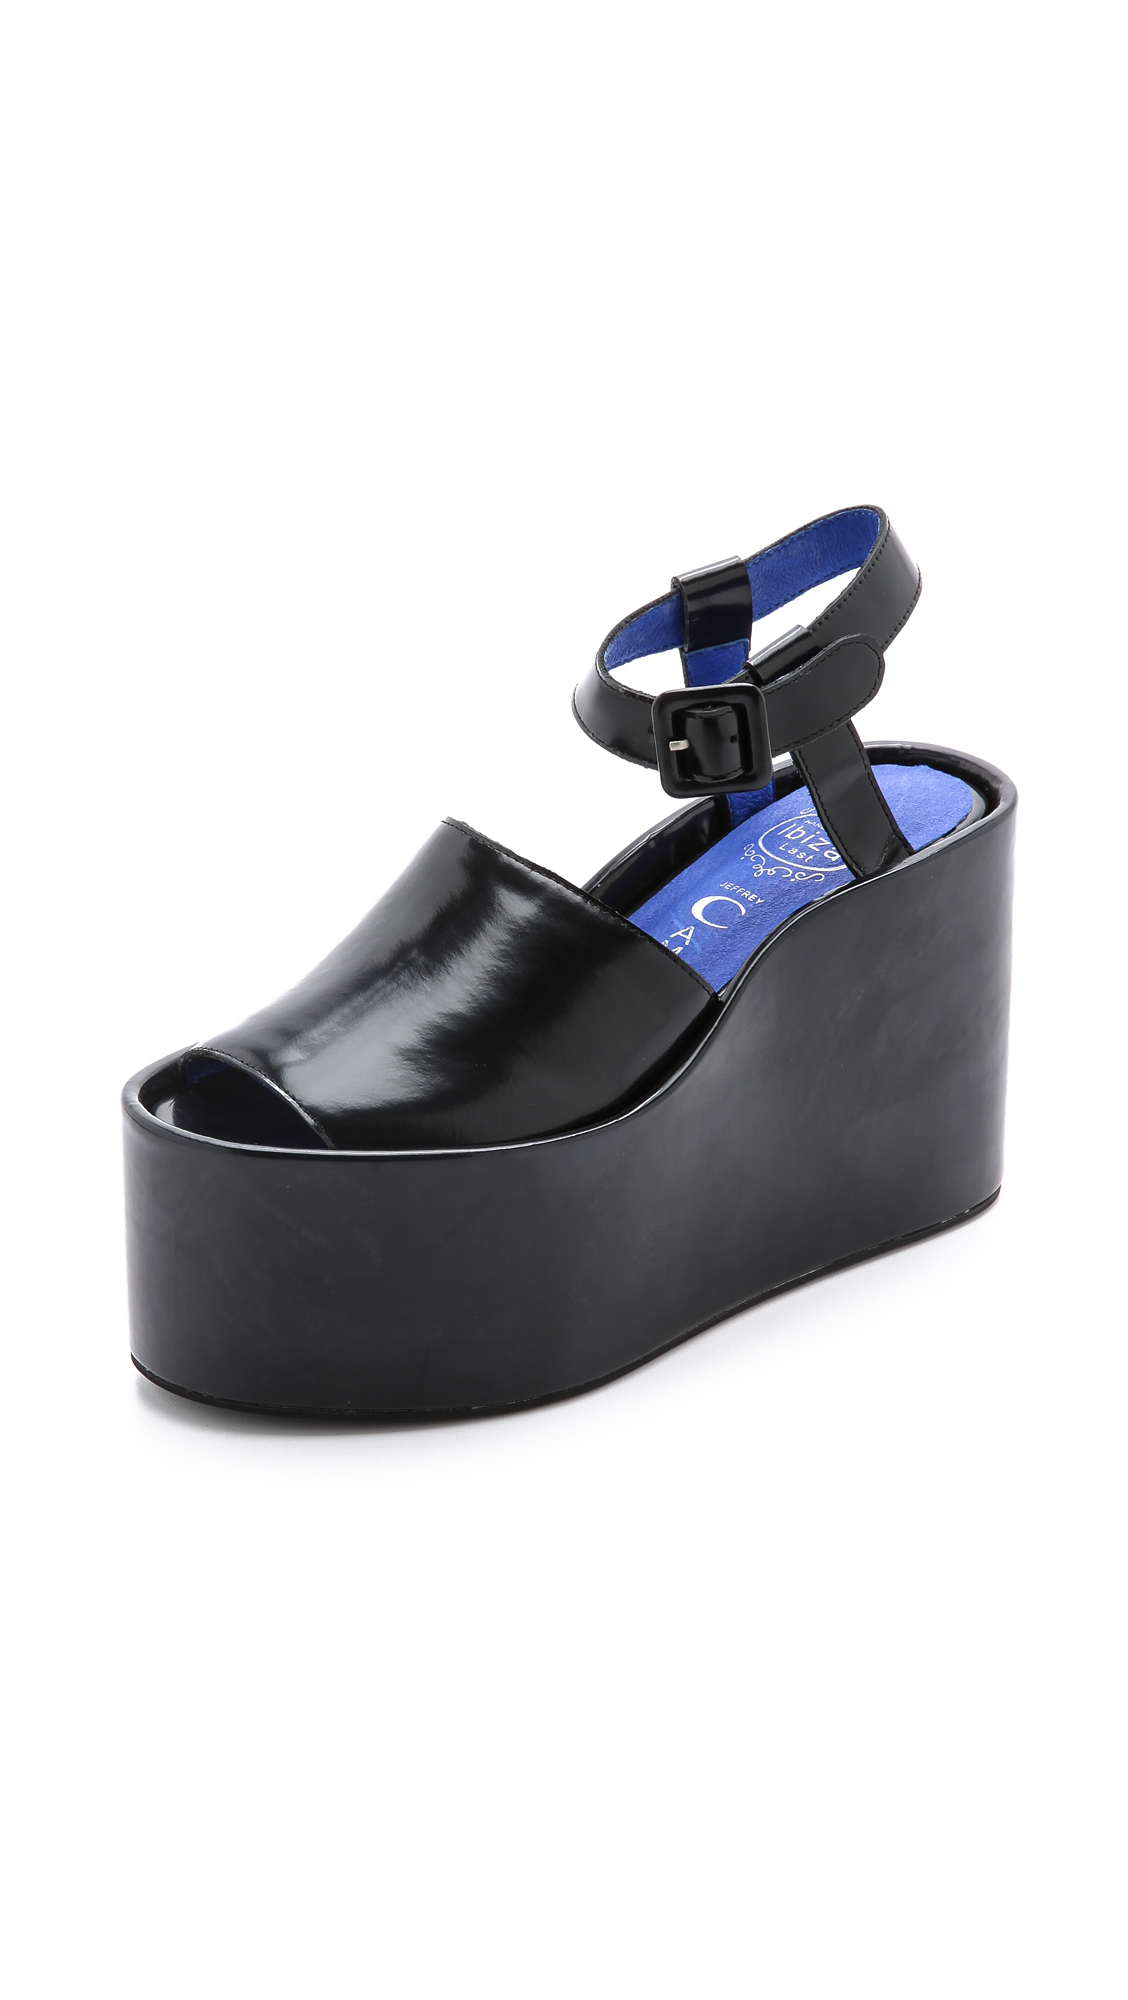 jeffrey cbell chynna flatform sandals black in black